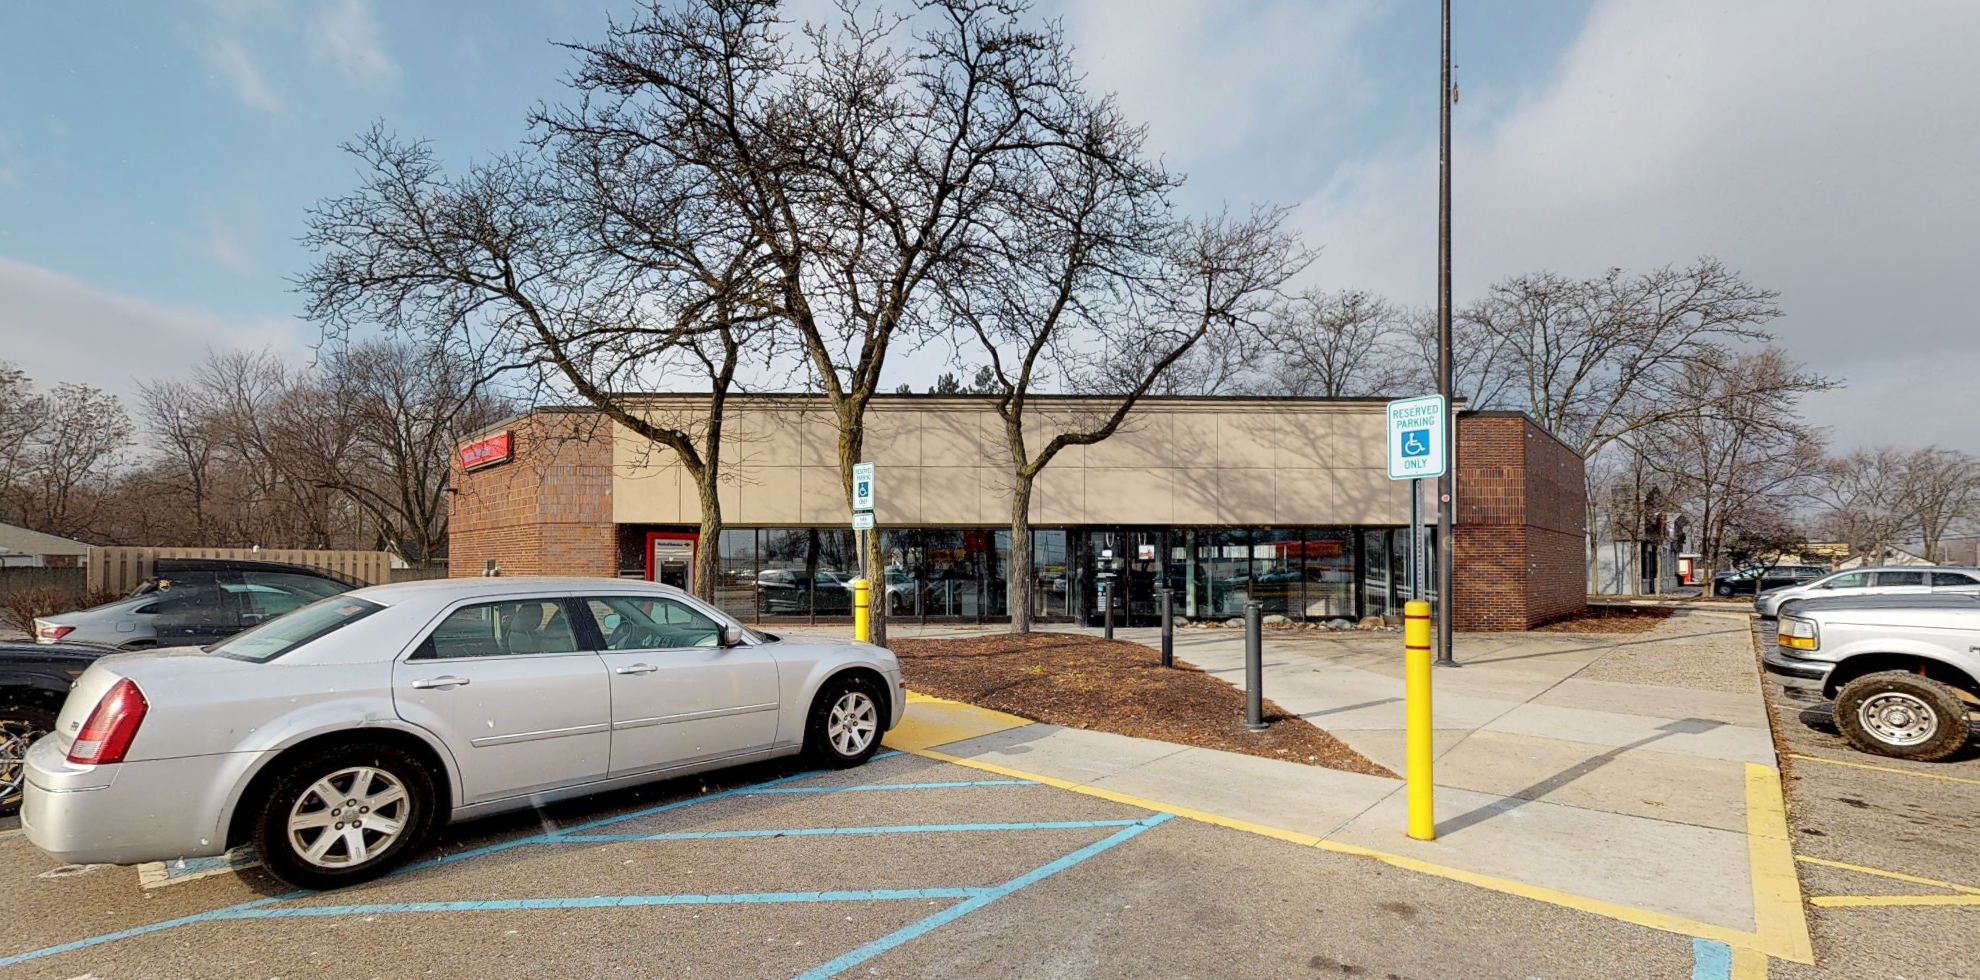 Bank of America financial center with drive-thru ATM   121 N Wayne Rd, Westland, MI 48185